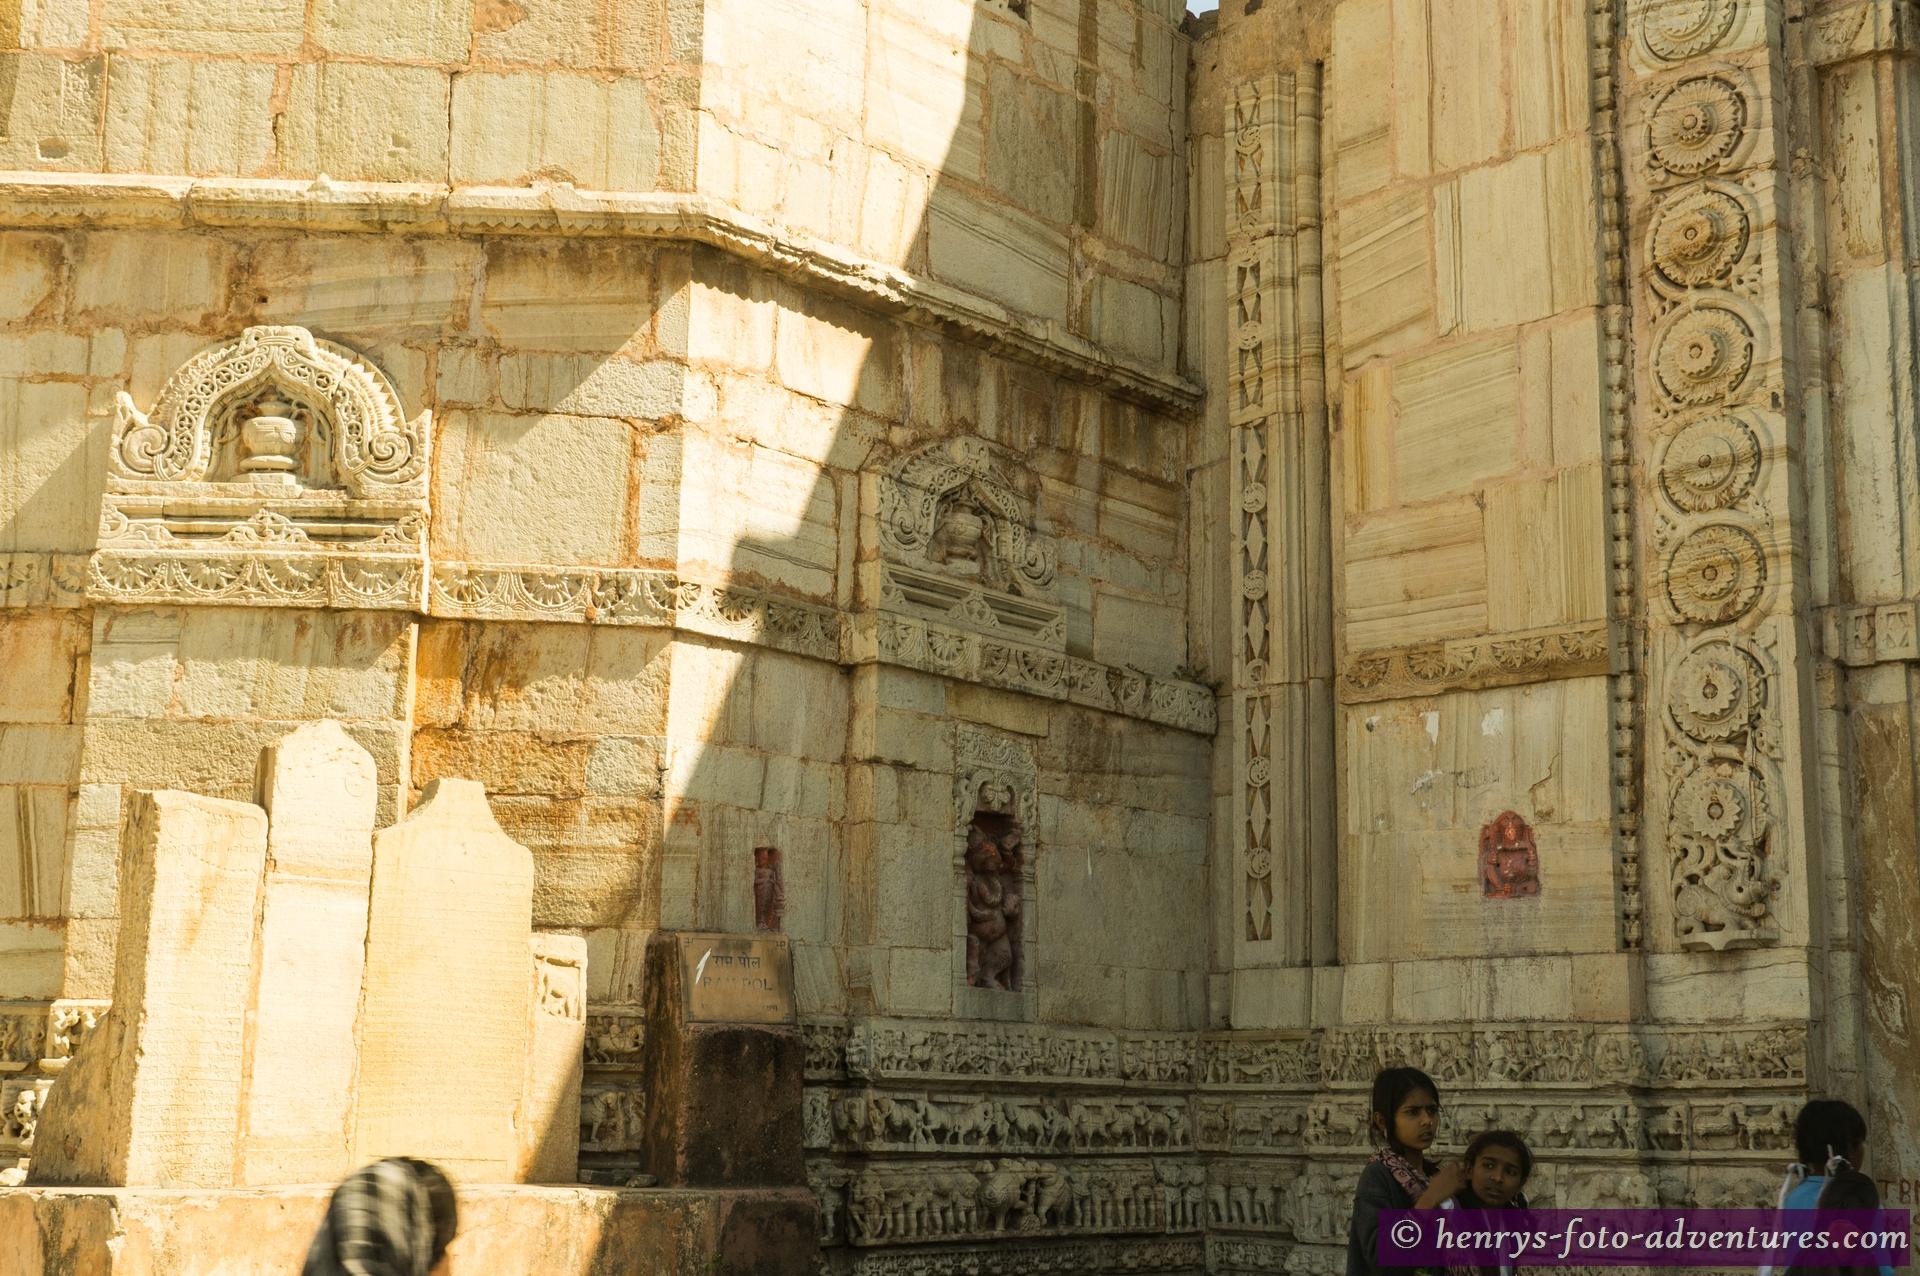 der Palast des Rana Kumbha